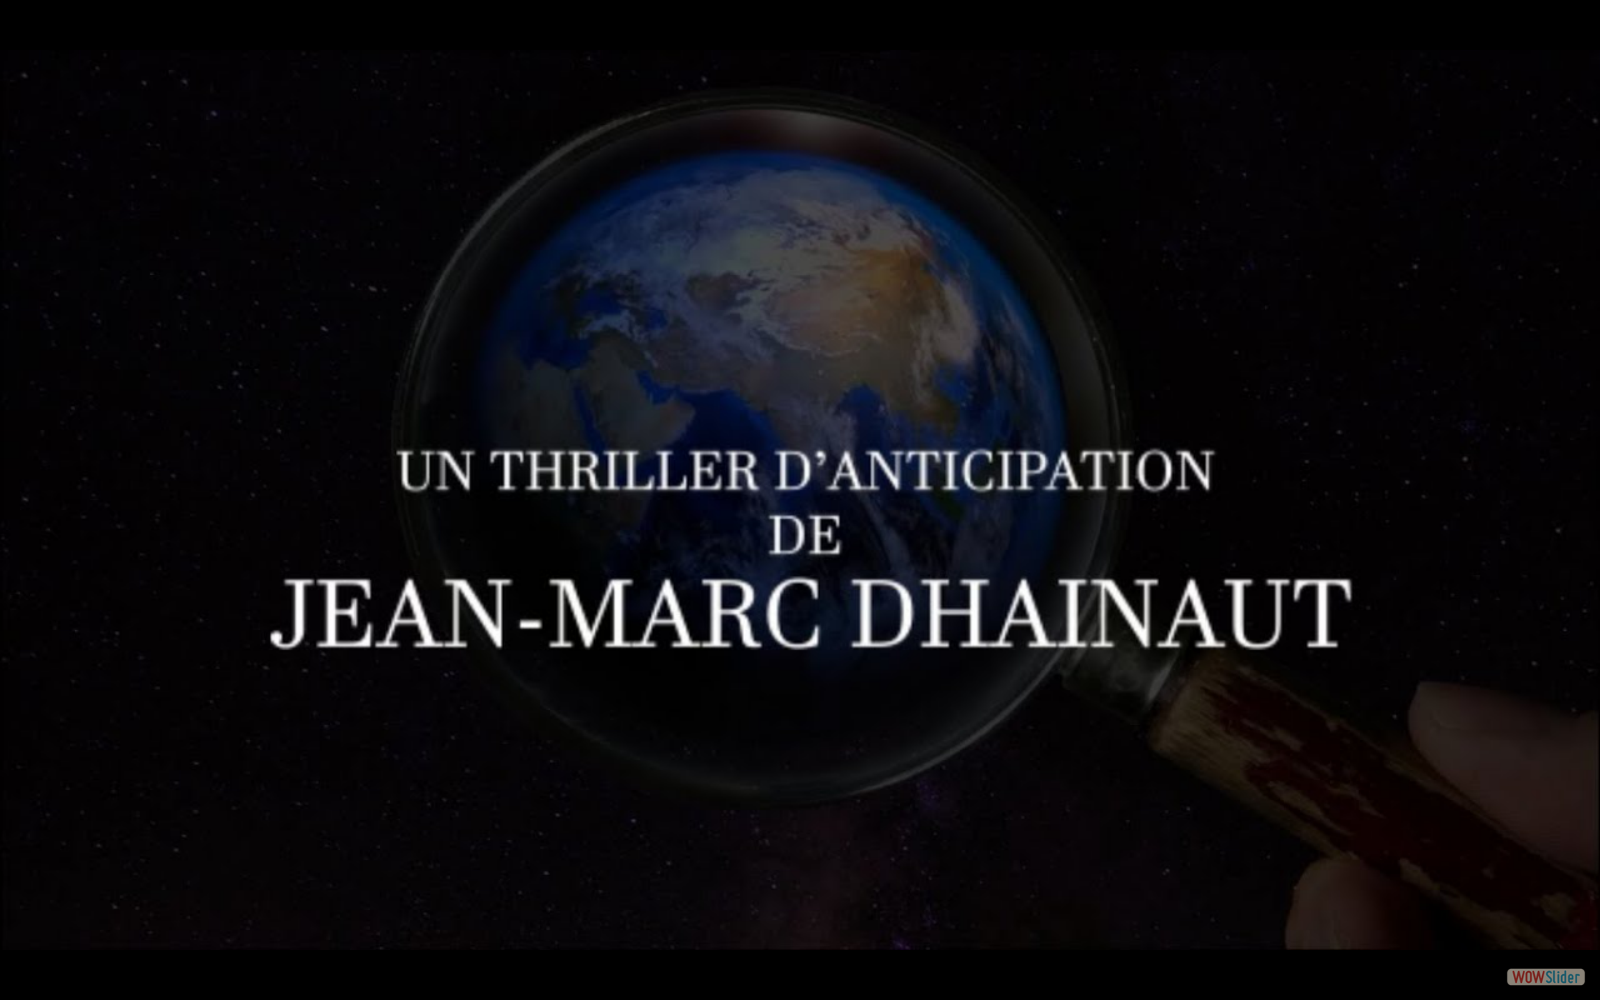 L'Oeil du chaos - Jean-Marc Dhainaut